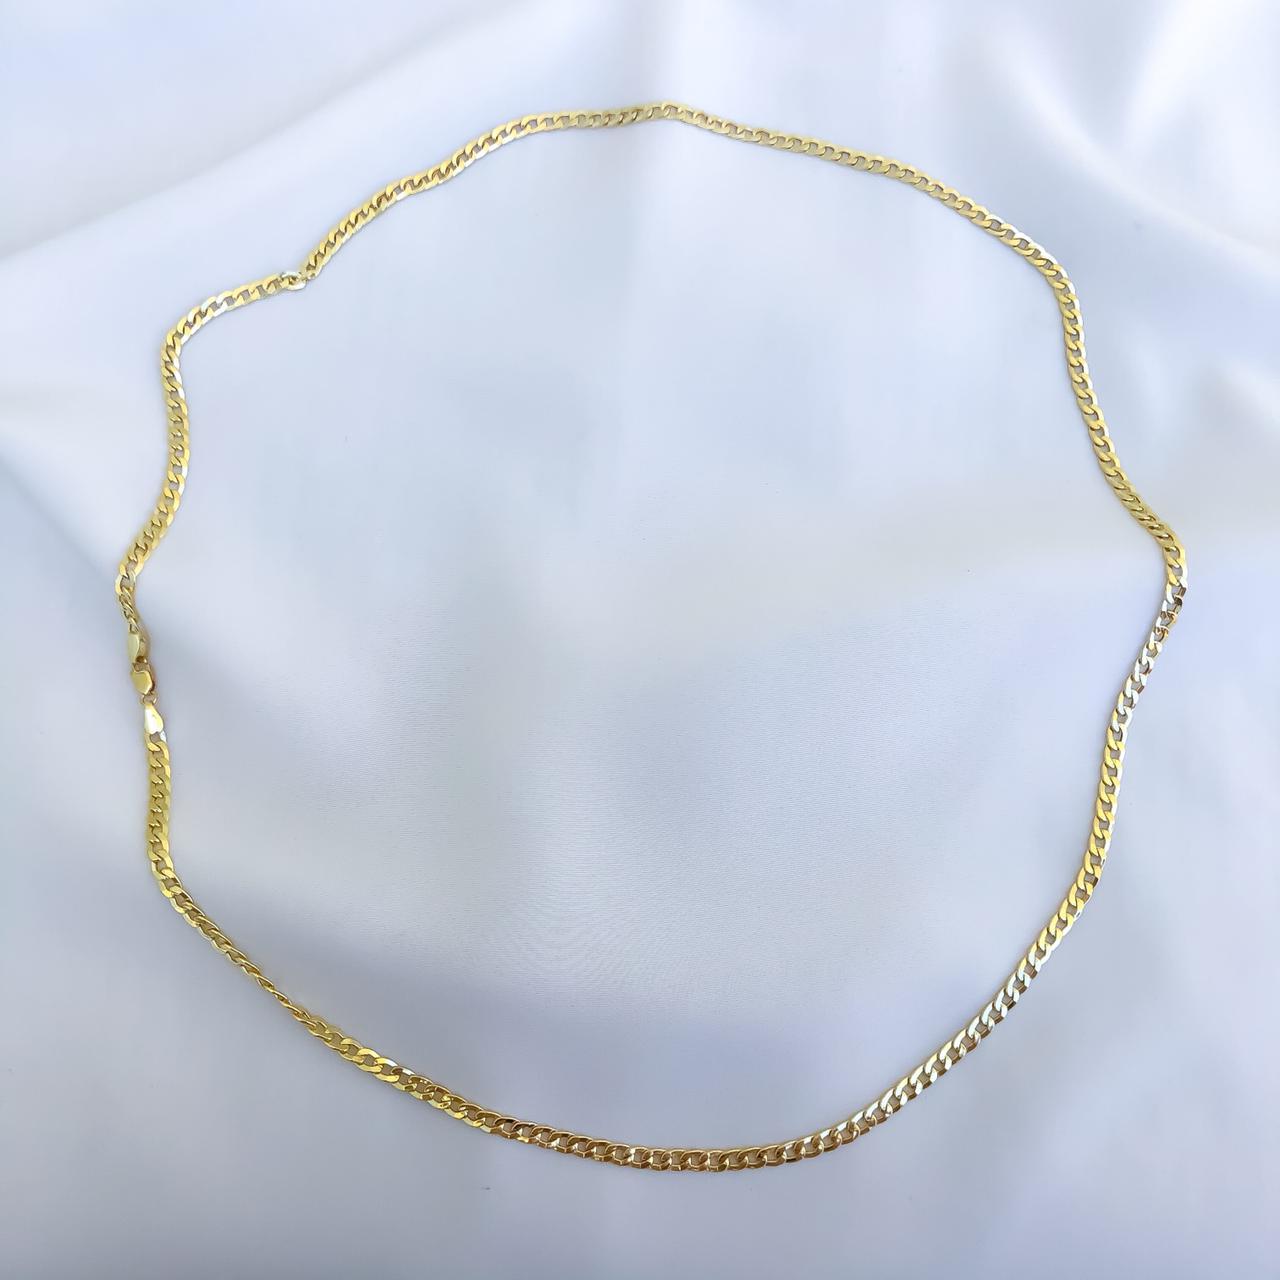 Corrente Groumet Fino em Ouro 18K 60cm